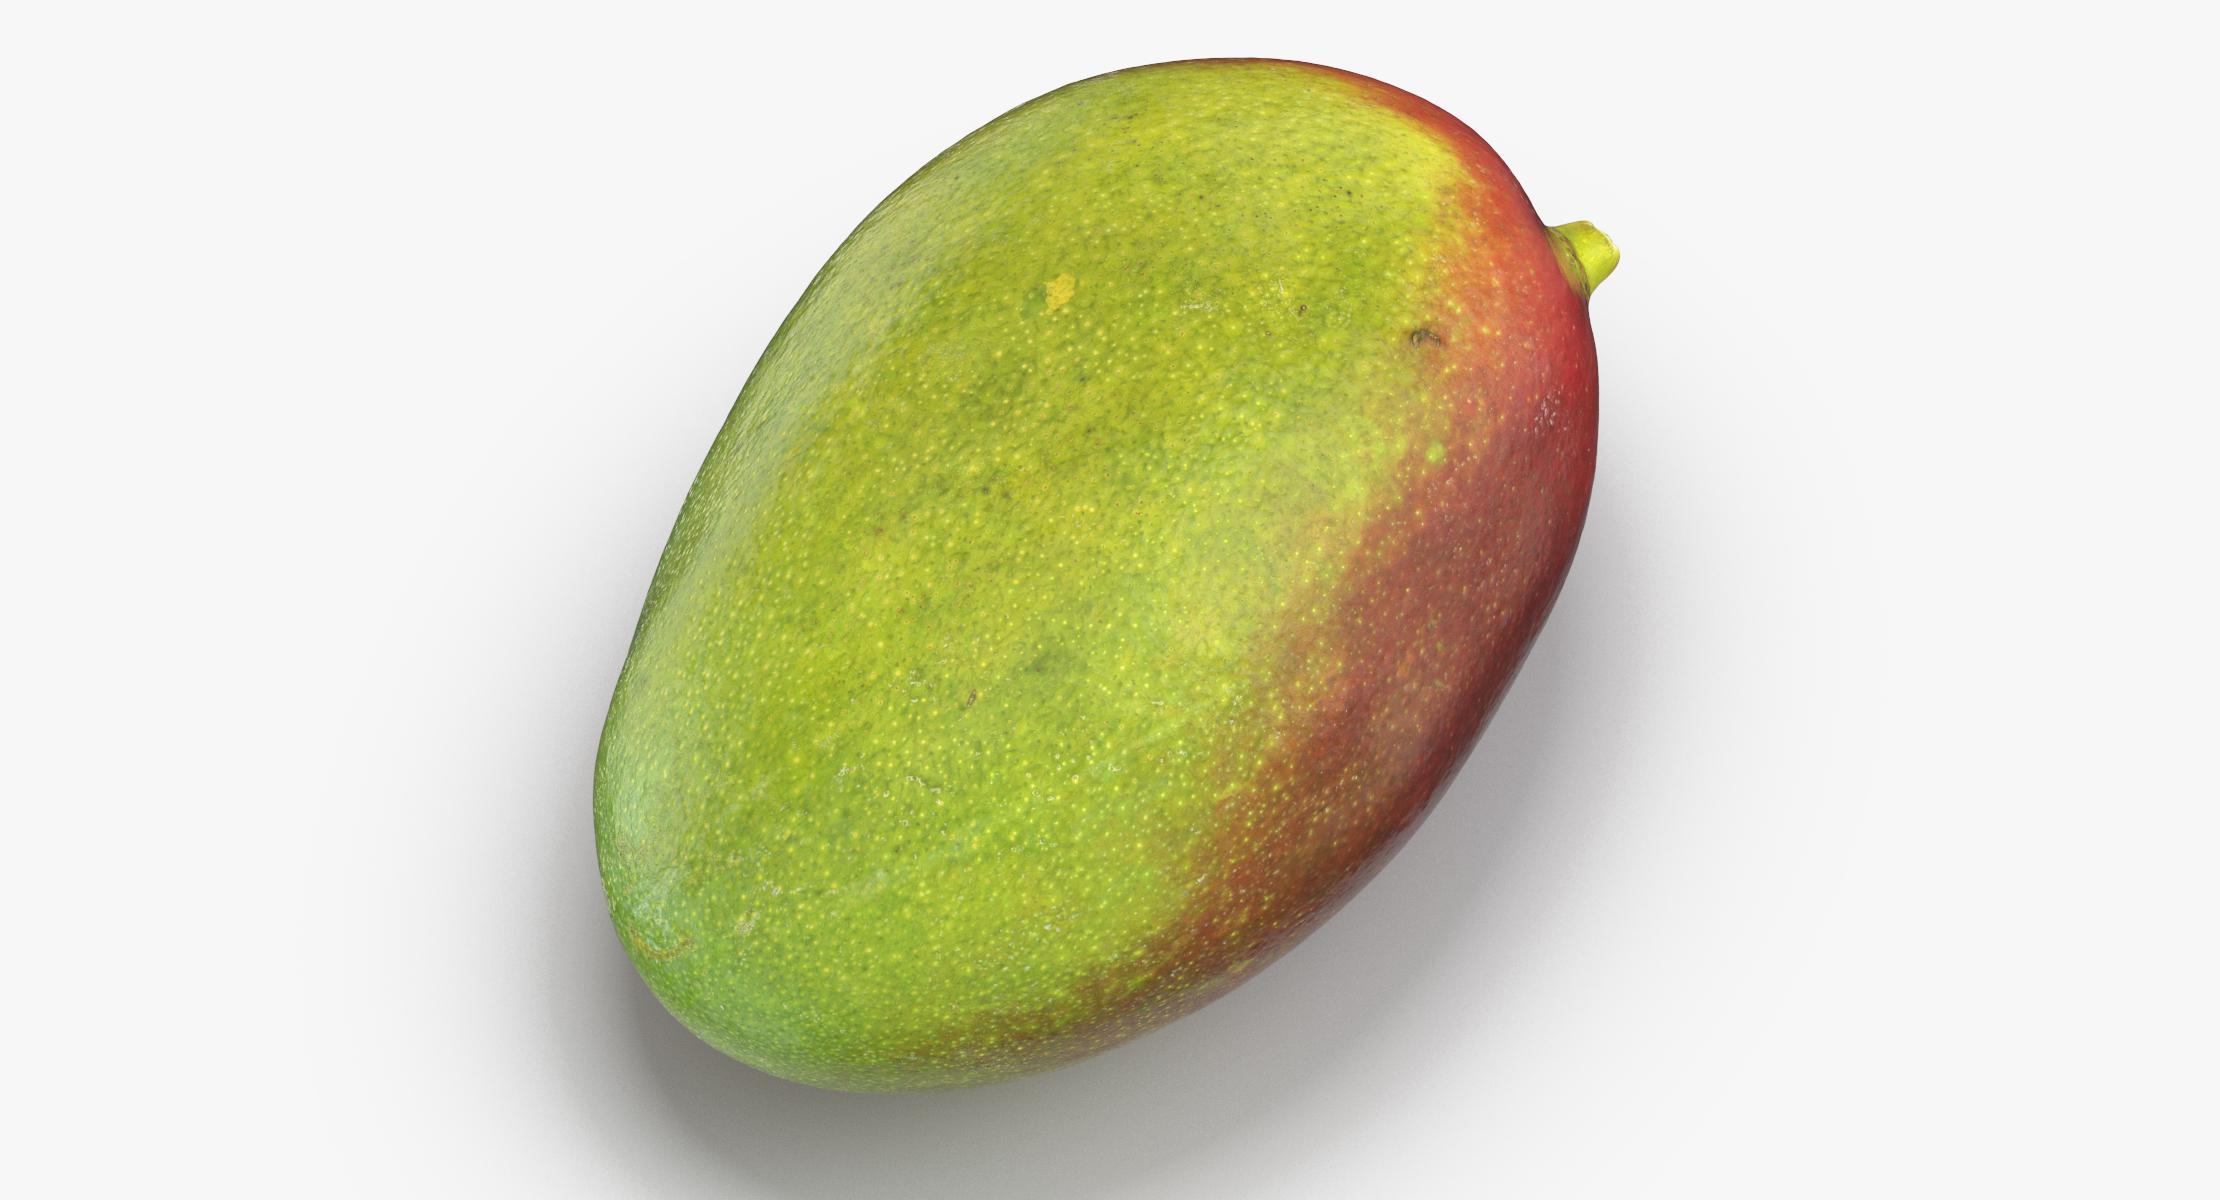 Mango 01 - reel 1